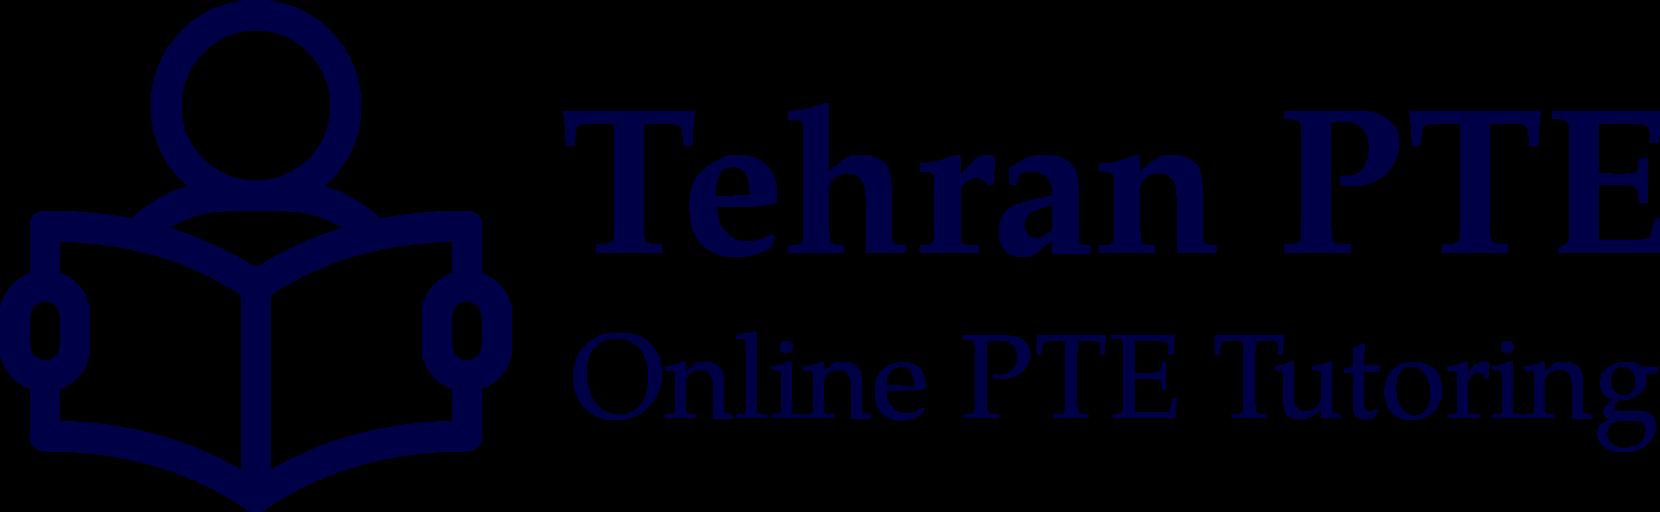 Tehranpte